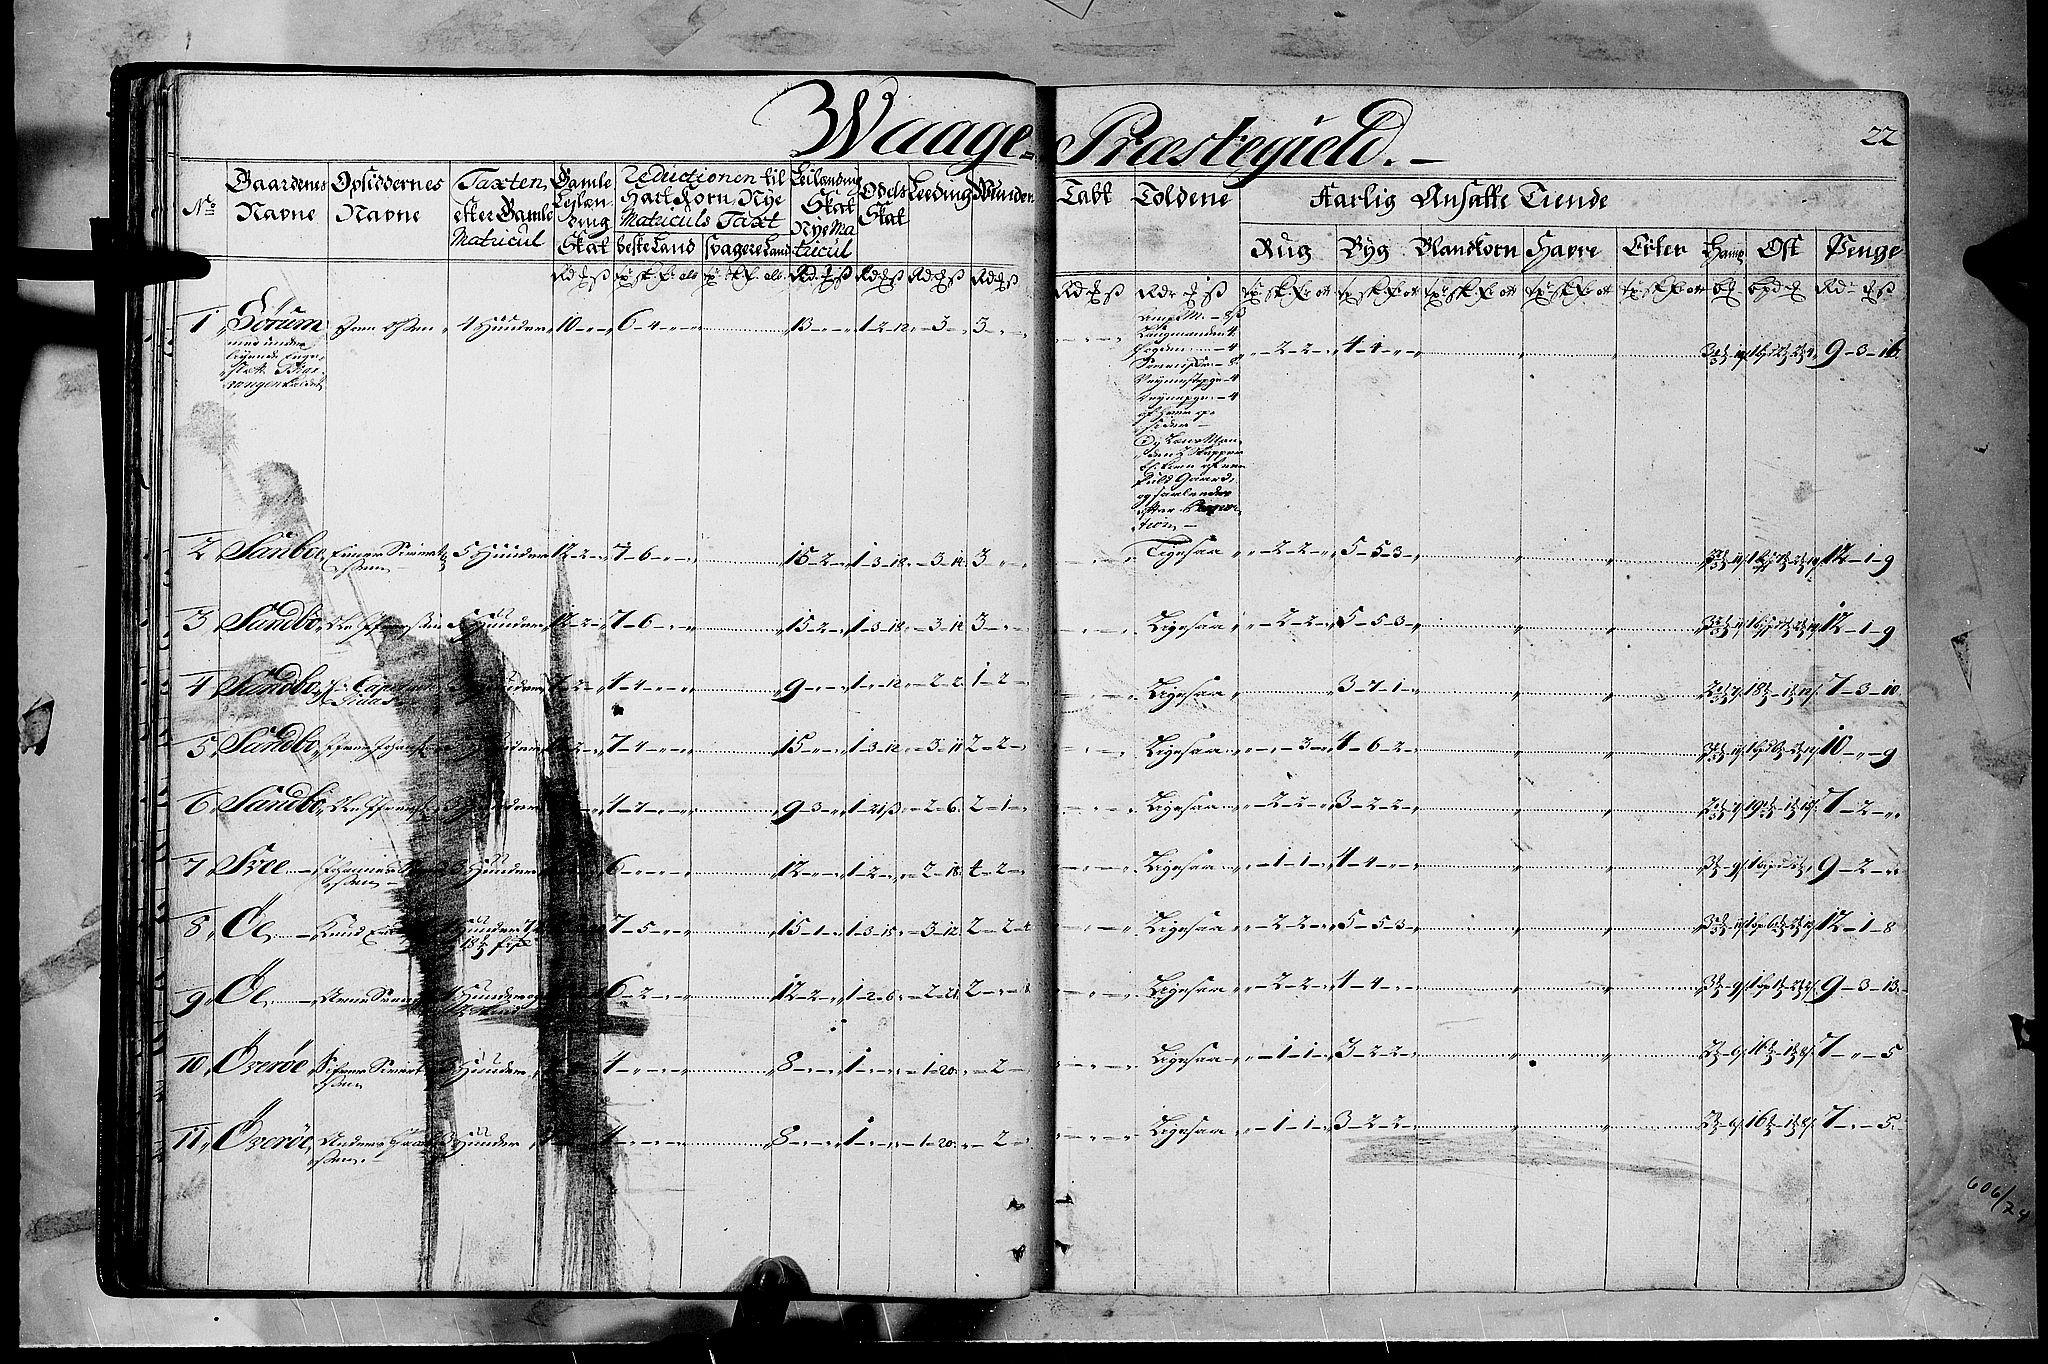 RA, Rentekammeret inntil 1814, Realistisk ordnet avdeling, N/Nb/Nbf/L0108: Gudbrandsdalen matrikkelprotokoll, 1723, s. 21b-22a